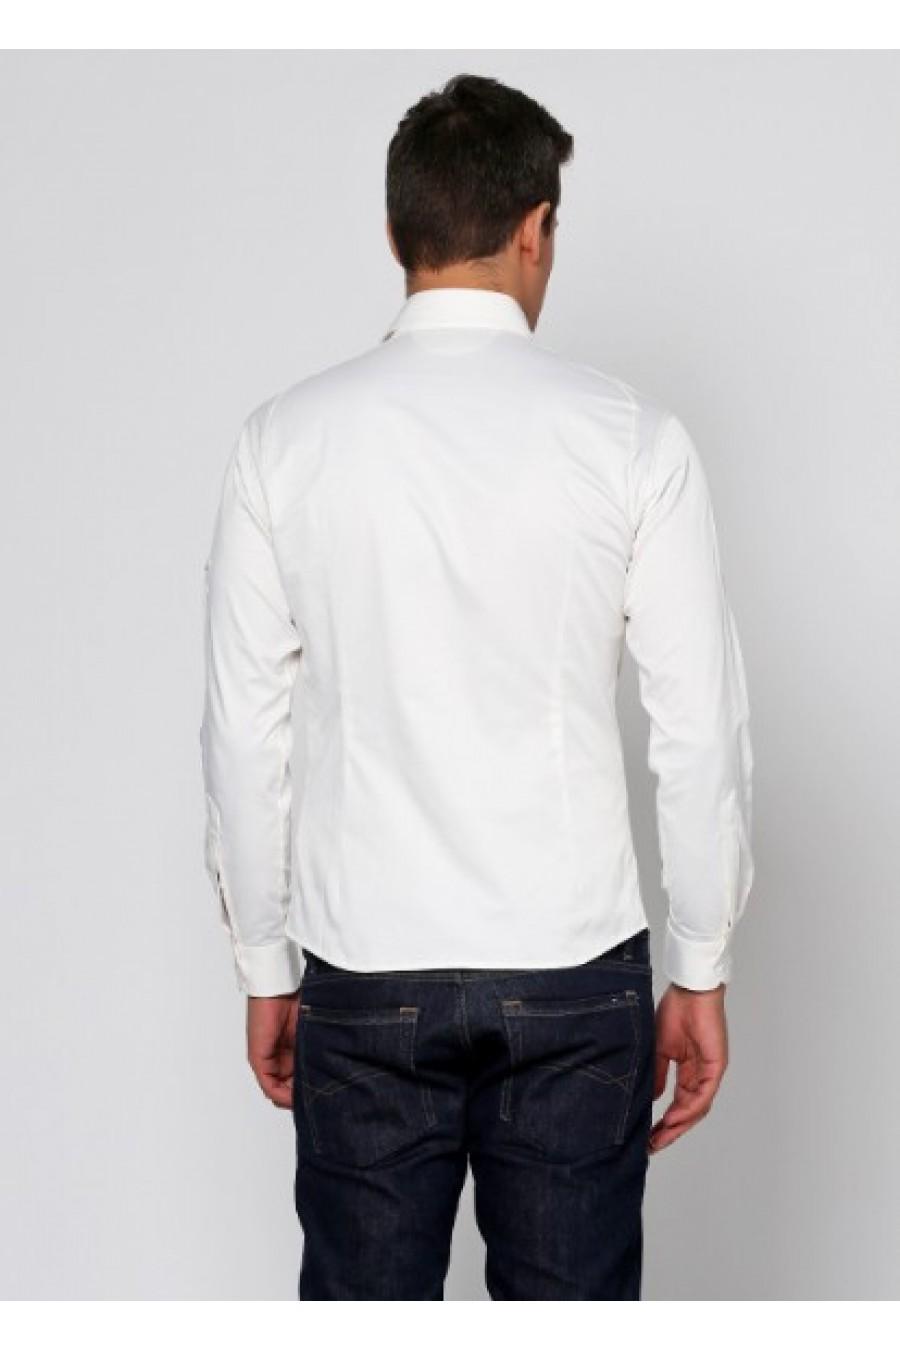 Мужская рубашка S-107-3